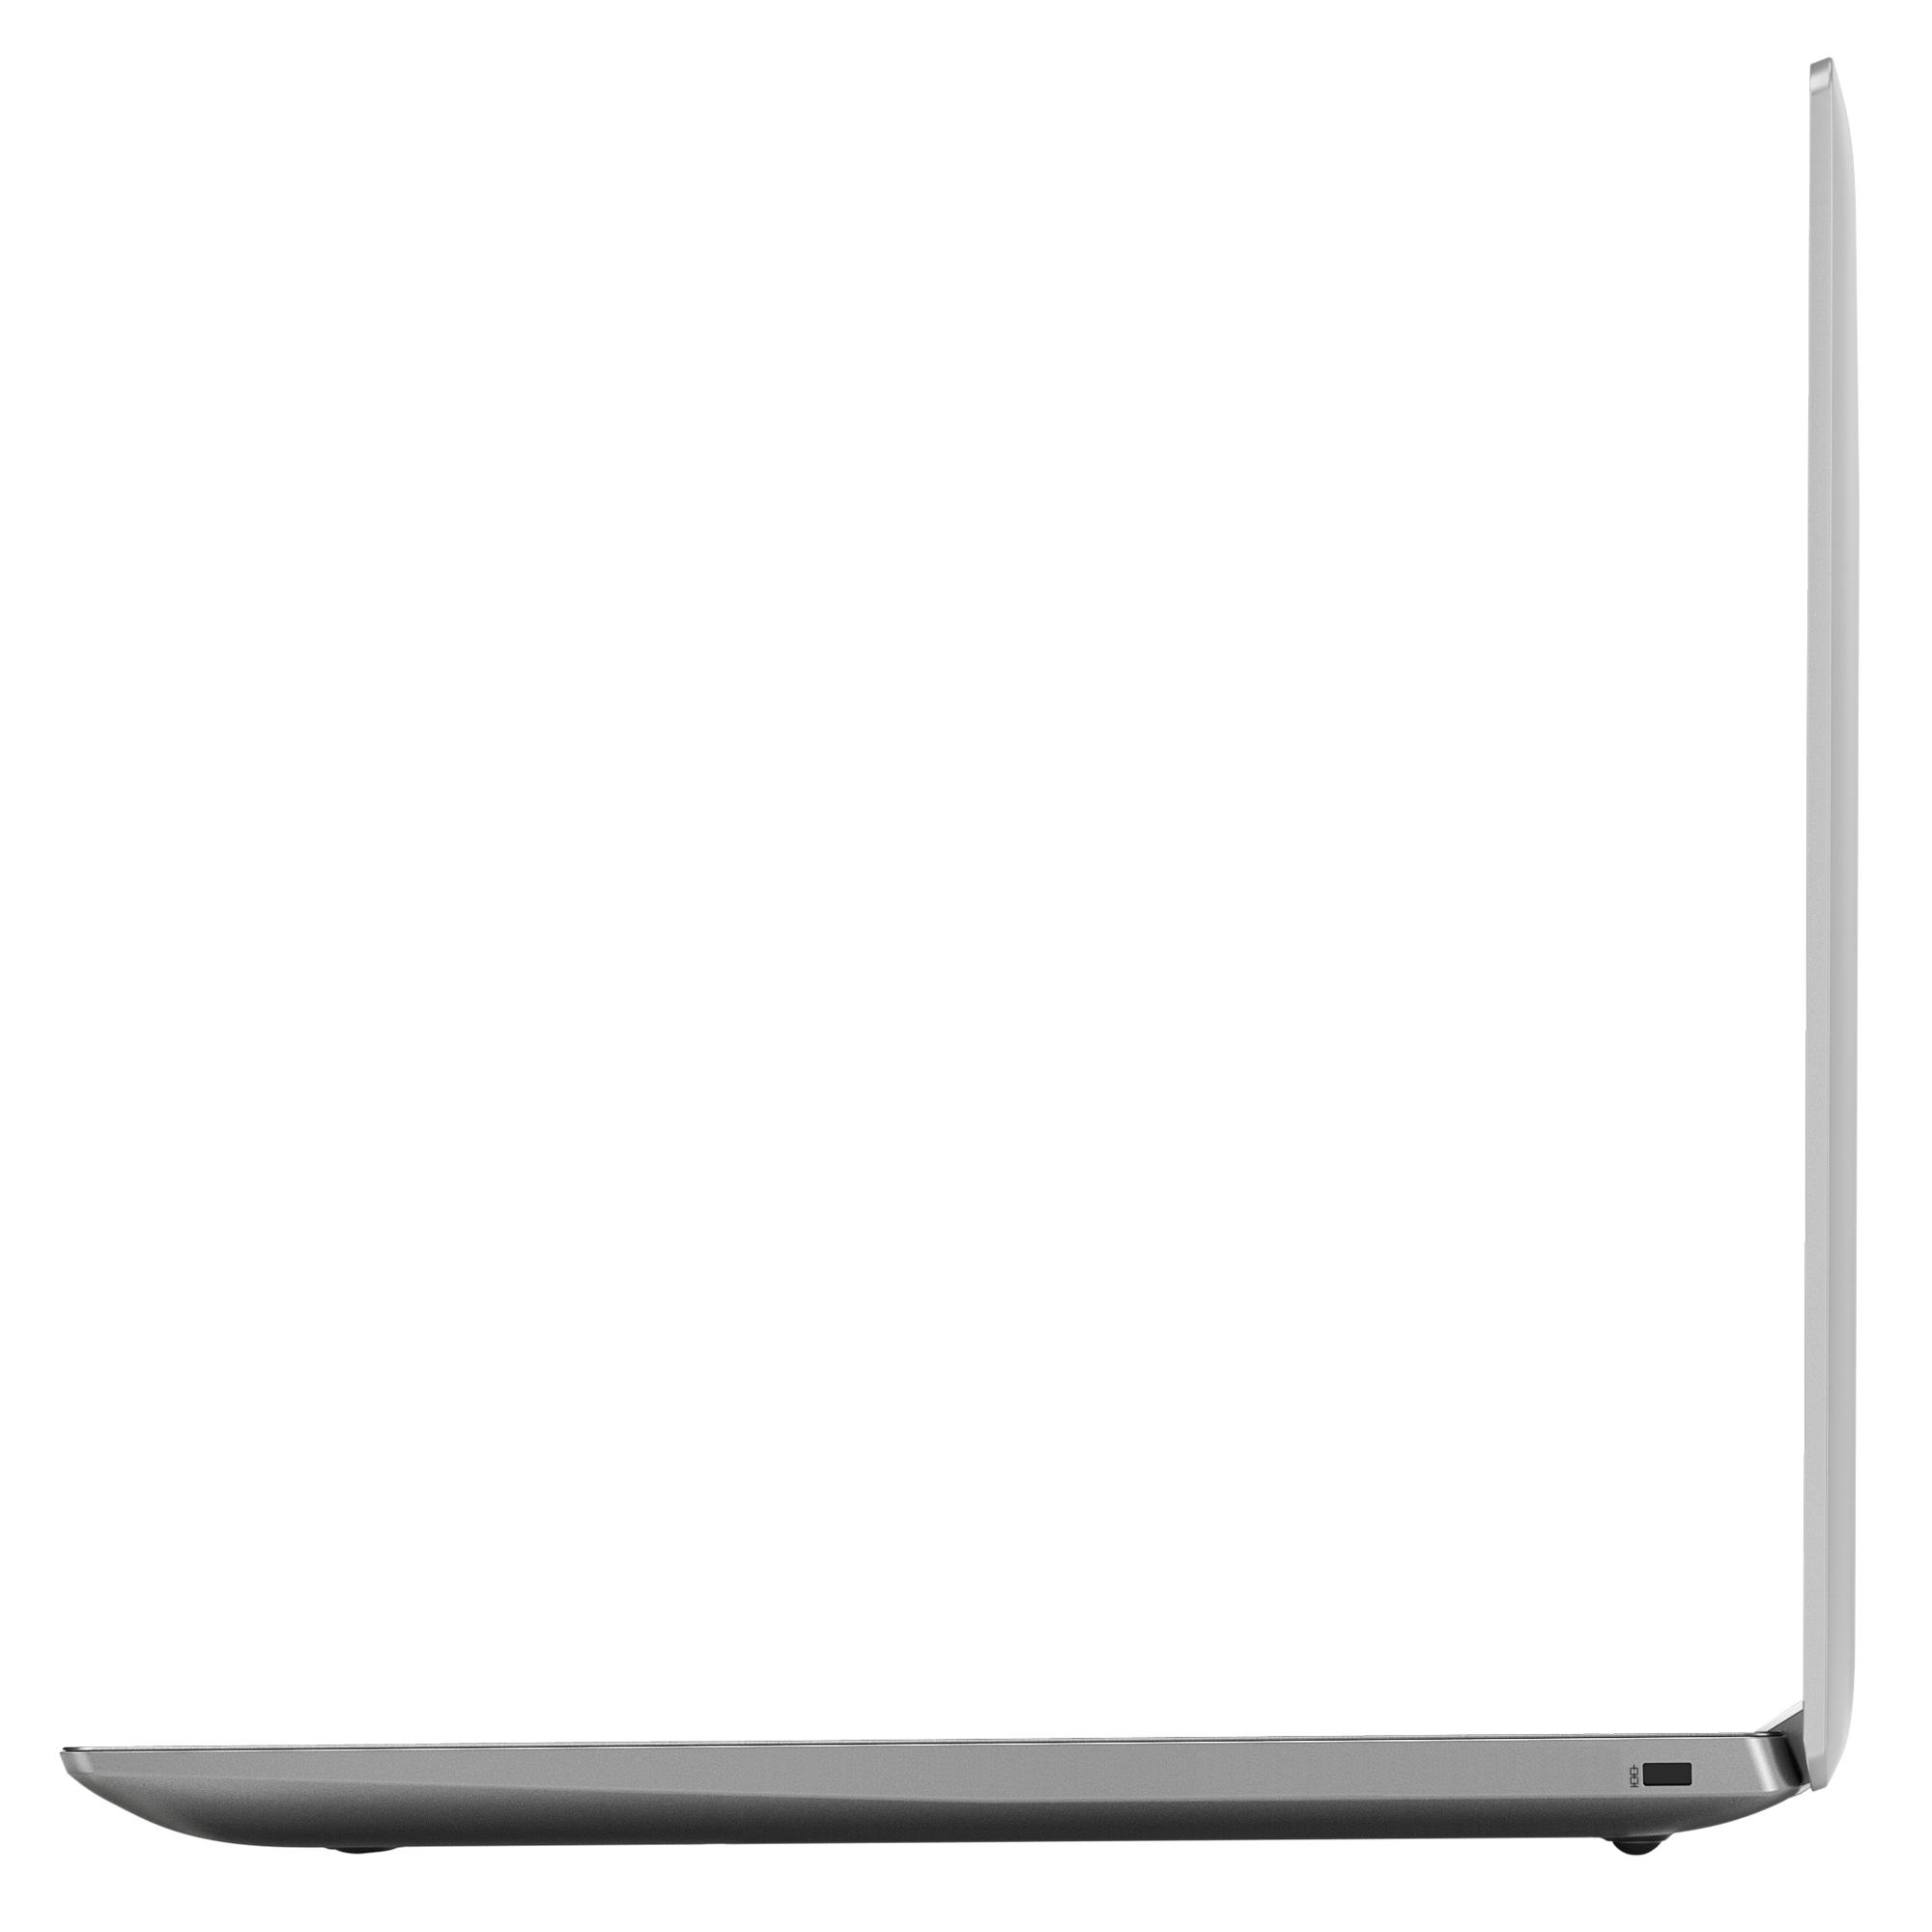 Фото  Ноутбук Lenovo ideapad 330-15IKB Platinum Grey (81DC00HWRU)